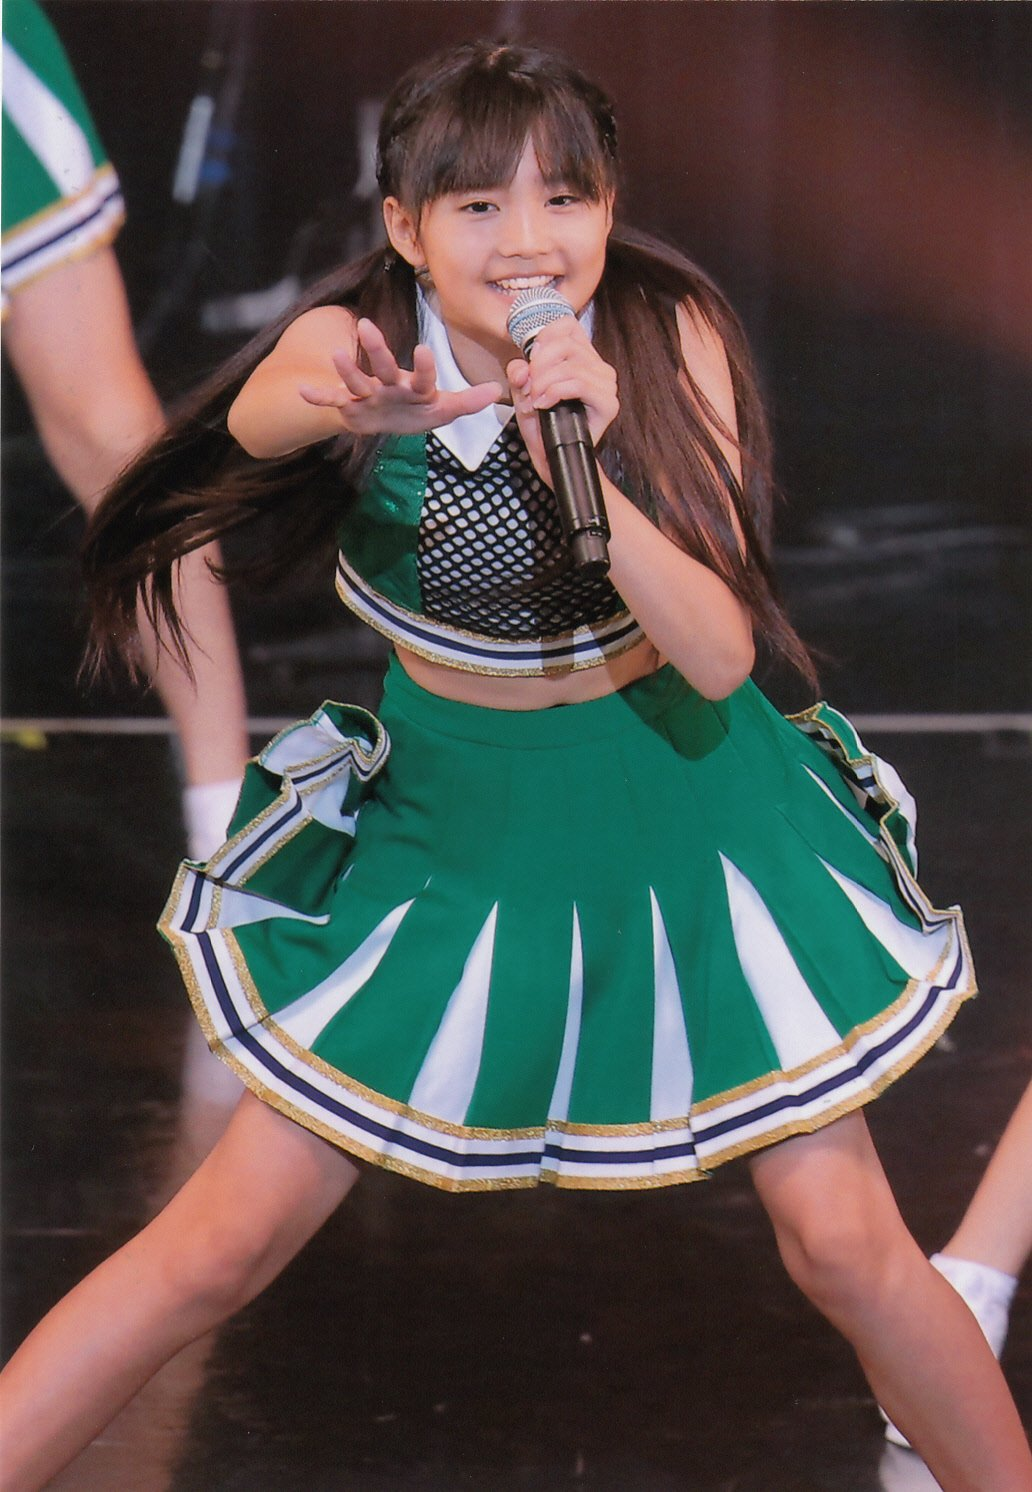 Concert, Doi Rena (土居麗菜), Hello! Project Kenshuusei